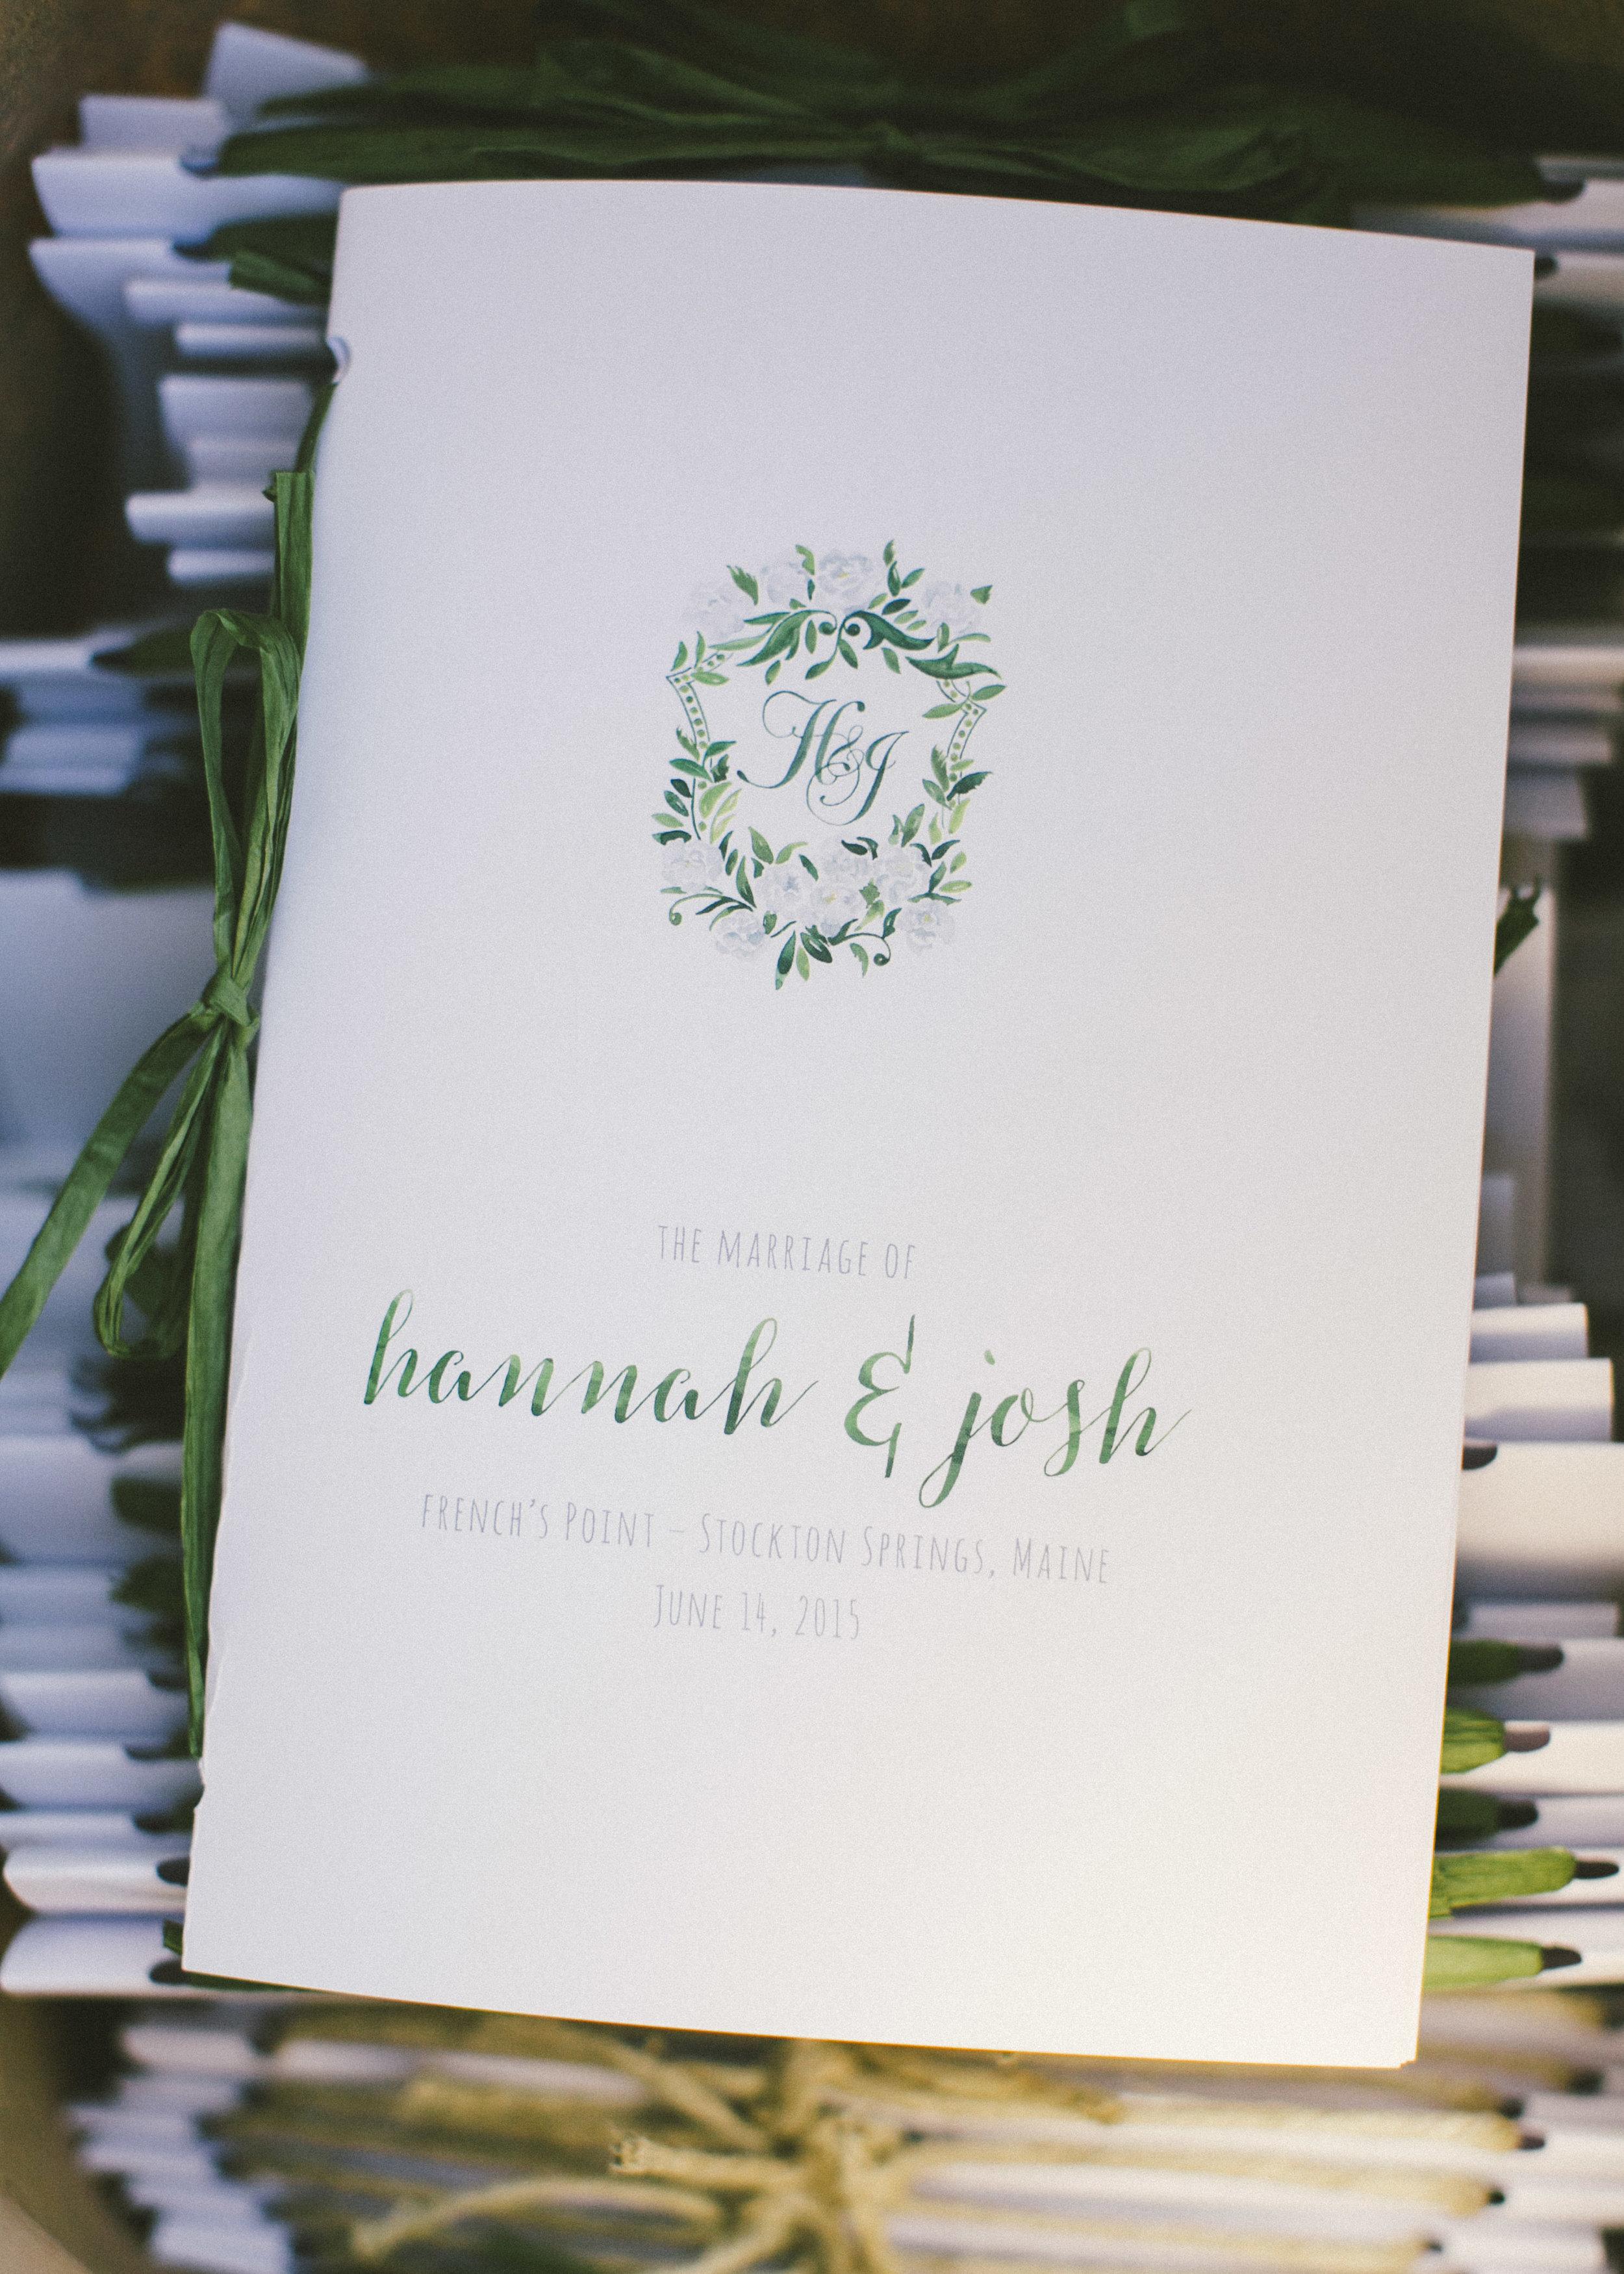 Josh Levine - Ceremony-CocktailHour018.jpg